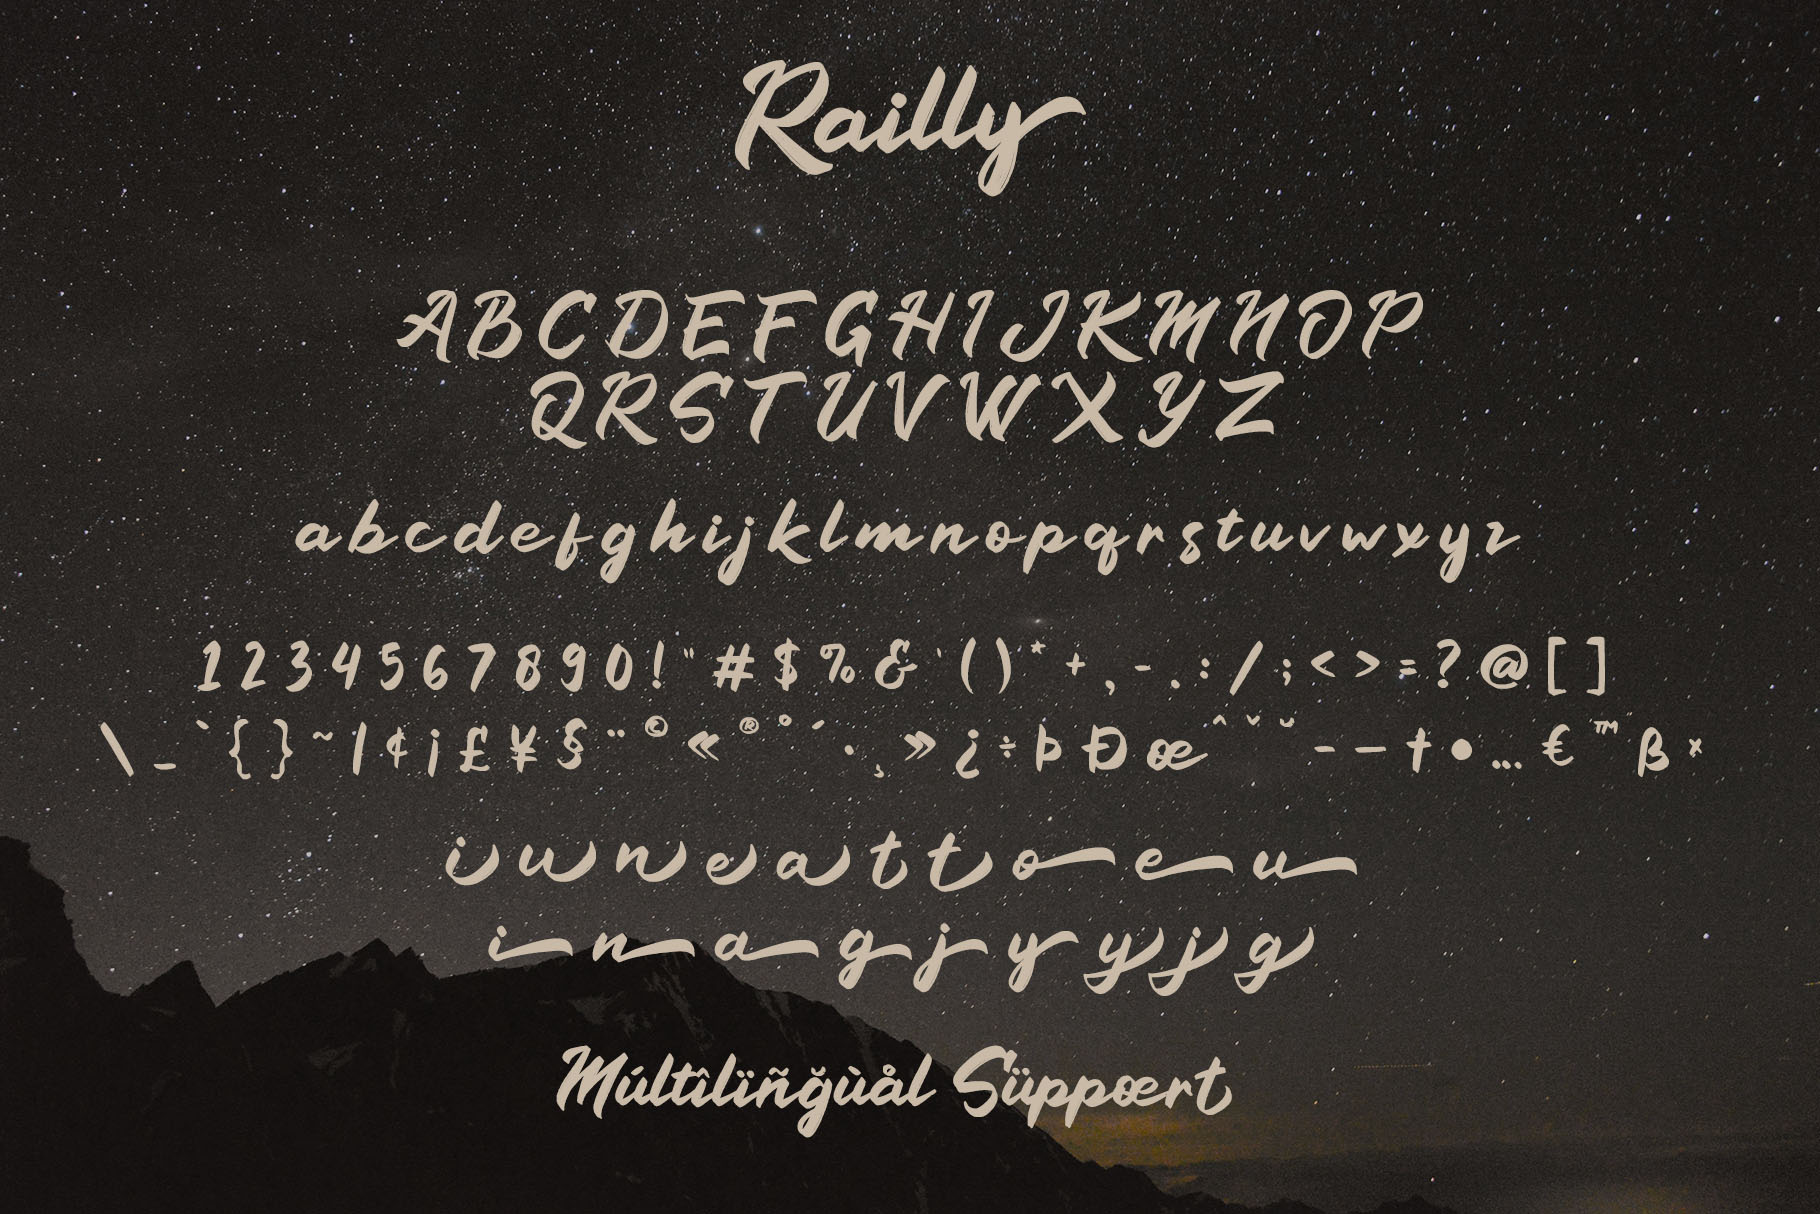 Railly - Handwritten Script Font example image 4